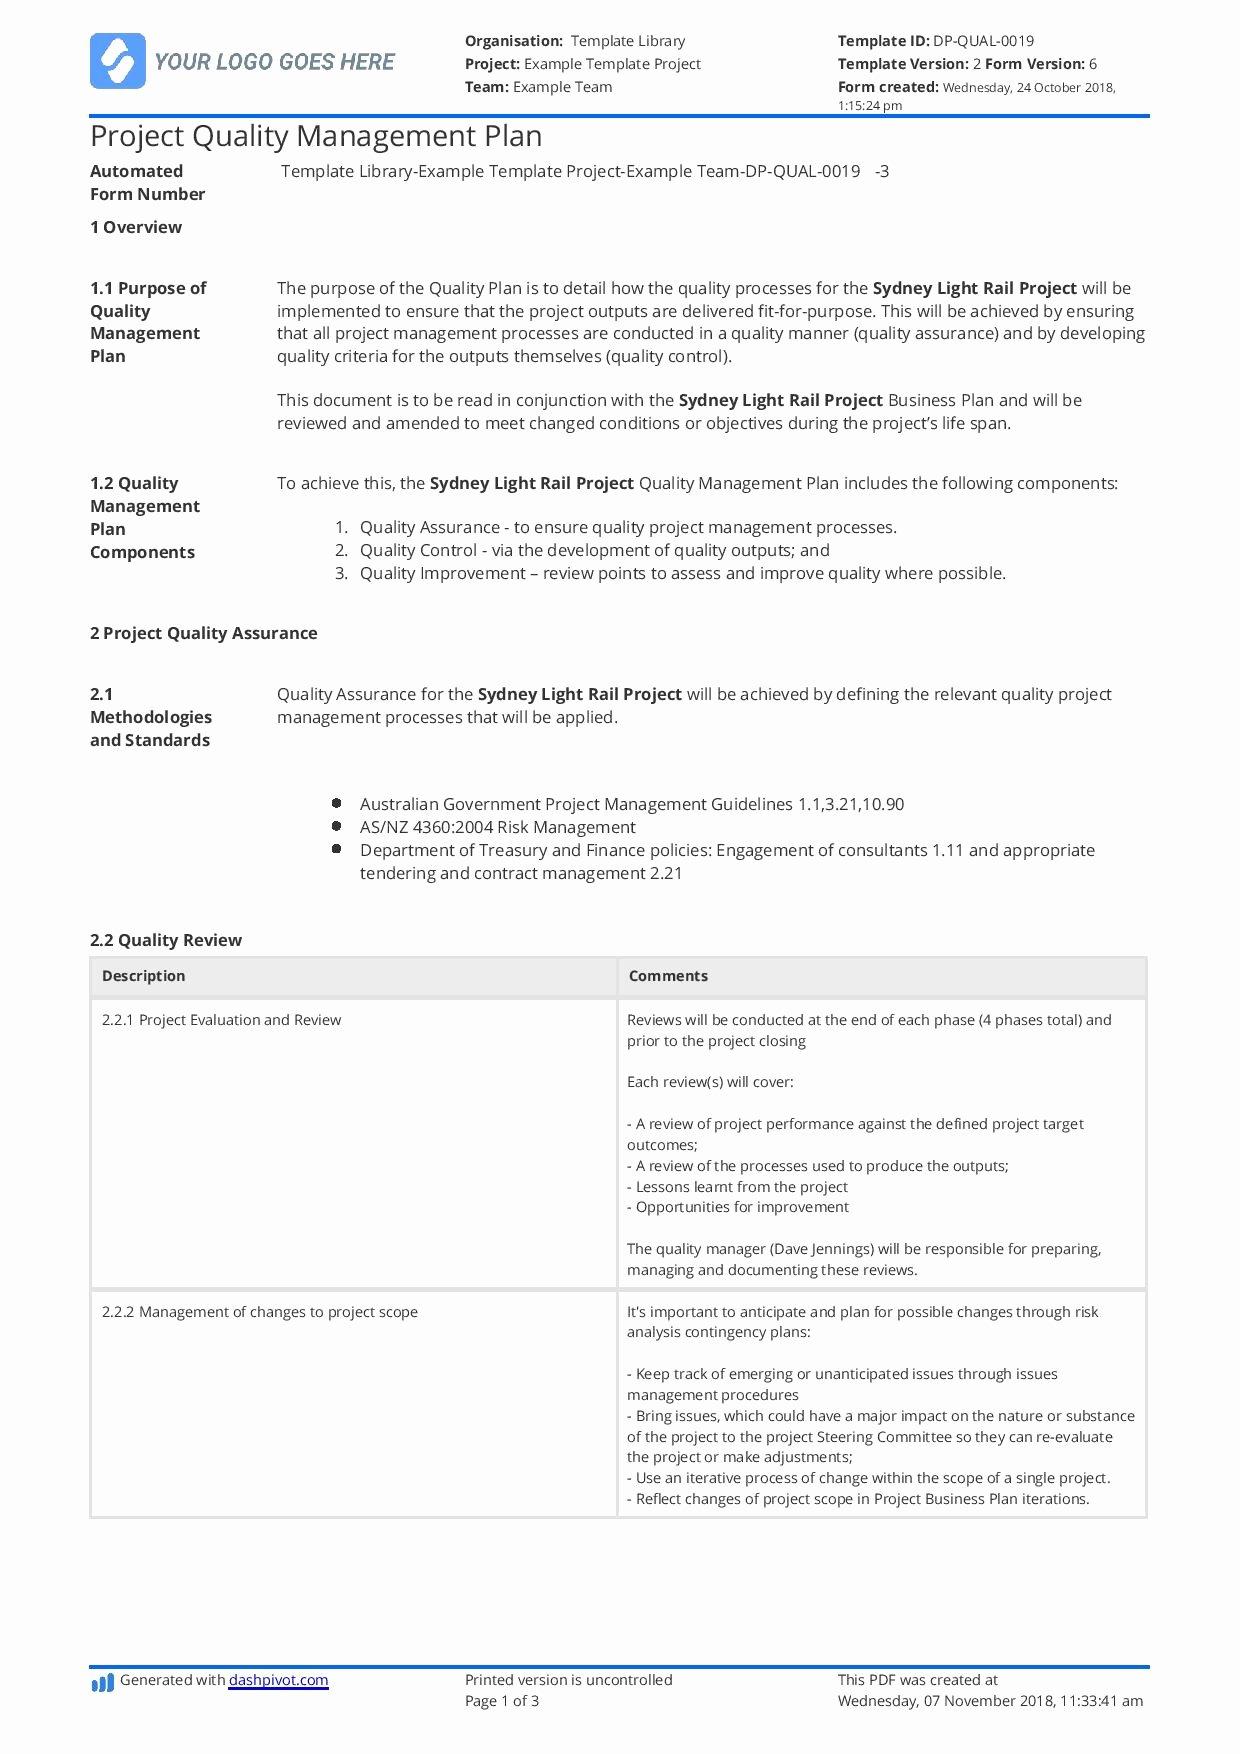 Quality Management Plan Templates Inspirational Construction Quality Management Plan [free and